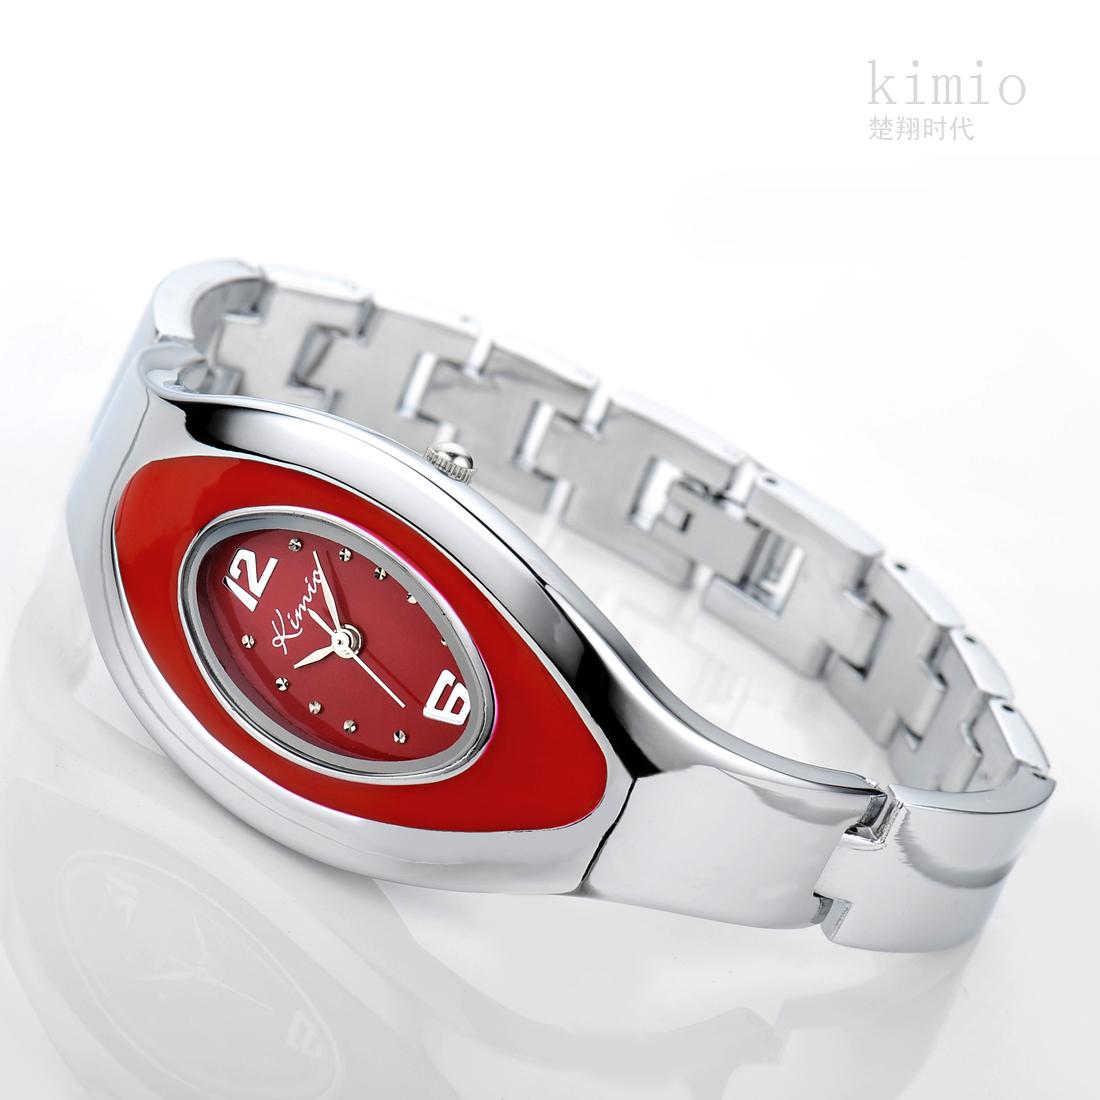 Часы Kimio 439 Кварцевые часы Женские Китай 2011